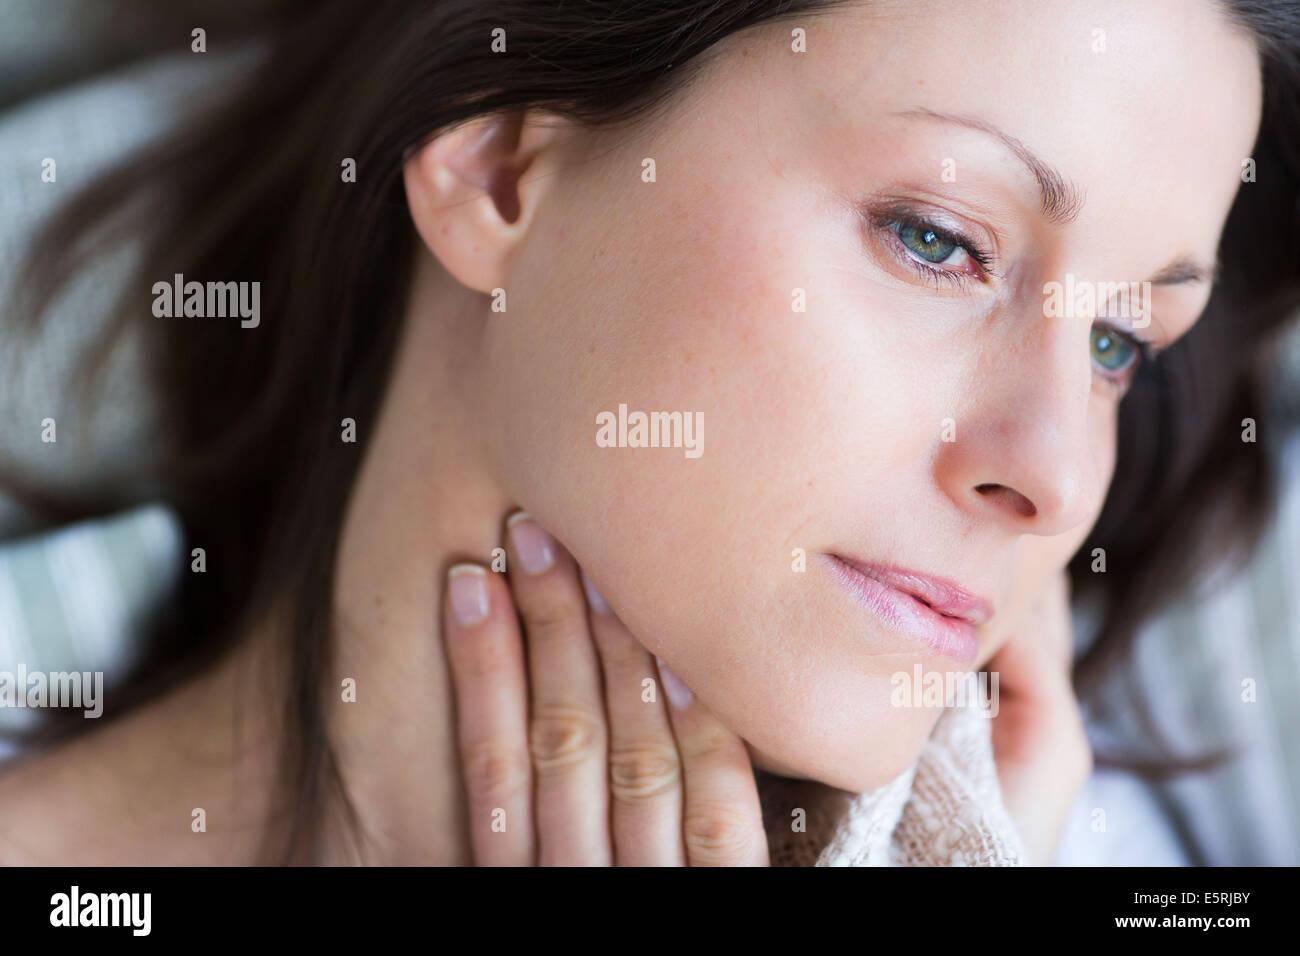 Sore throat. Woman stroking her throat. - Stock Image